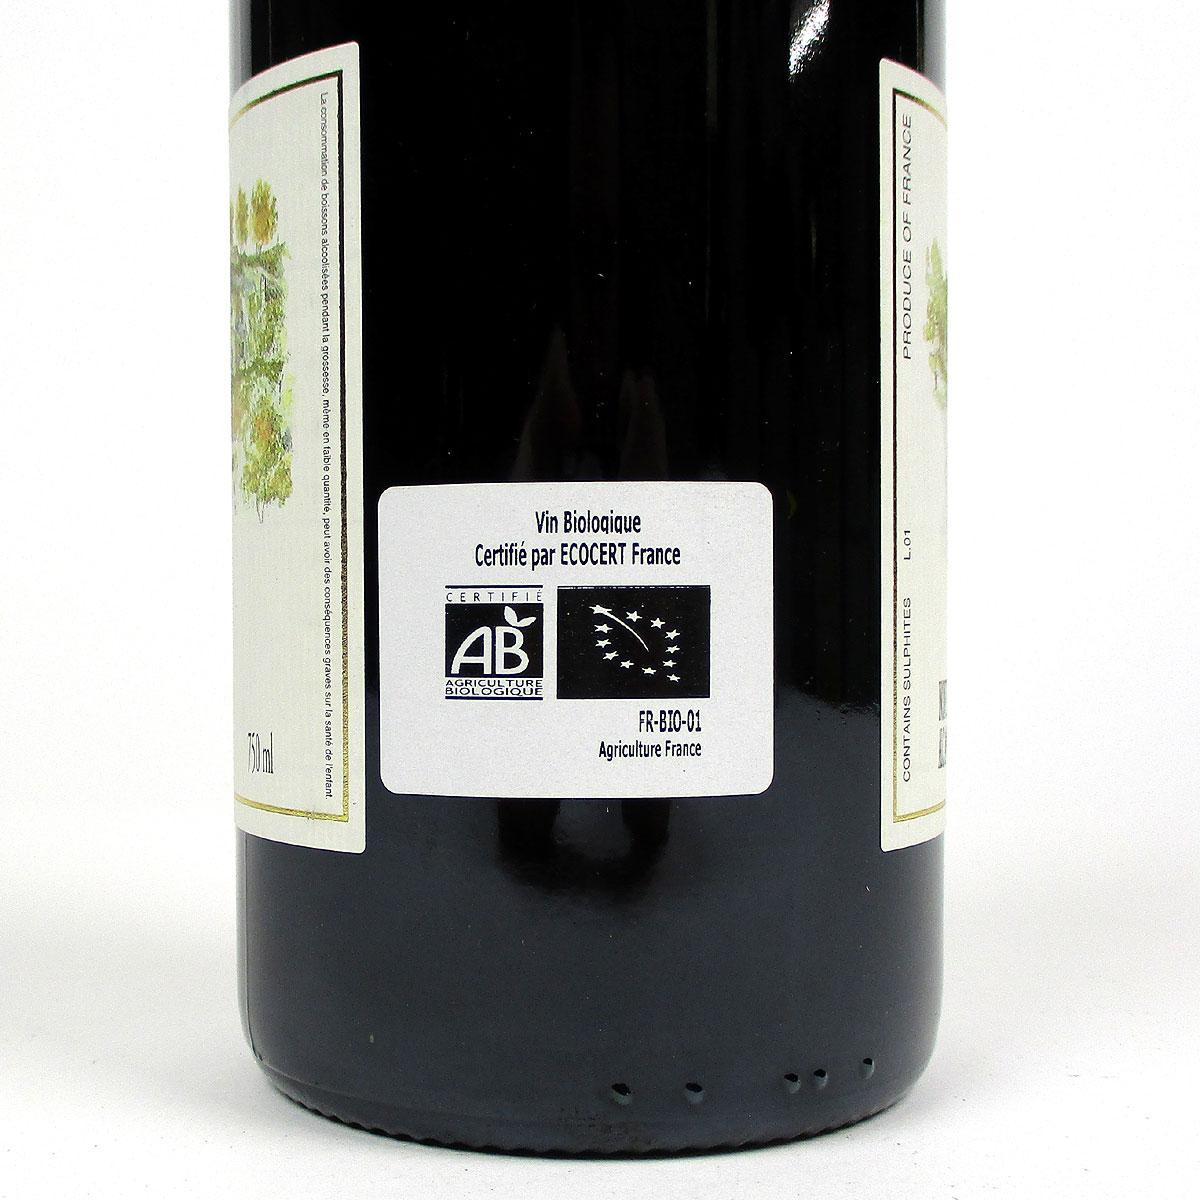 Saumur Champigny: Domaine Filliatreau 'La Grande Vignolle' 2020 - Organic Label